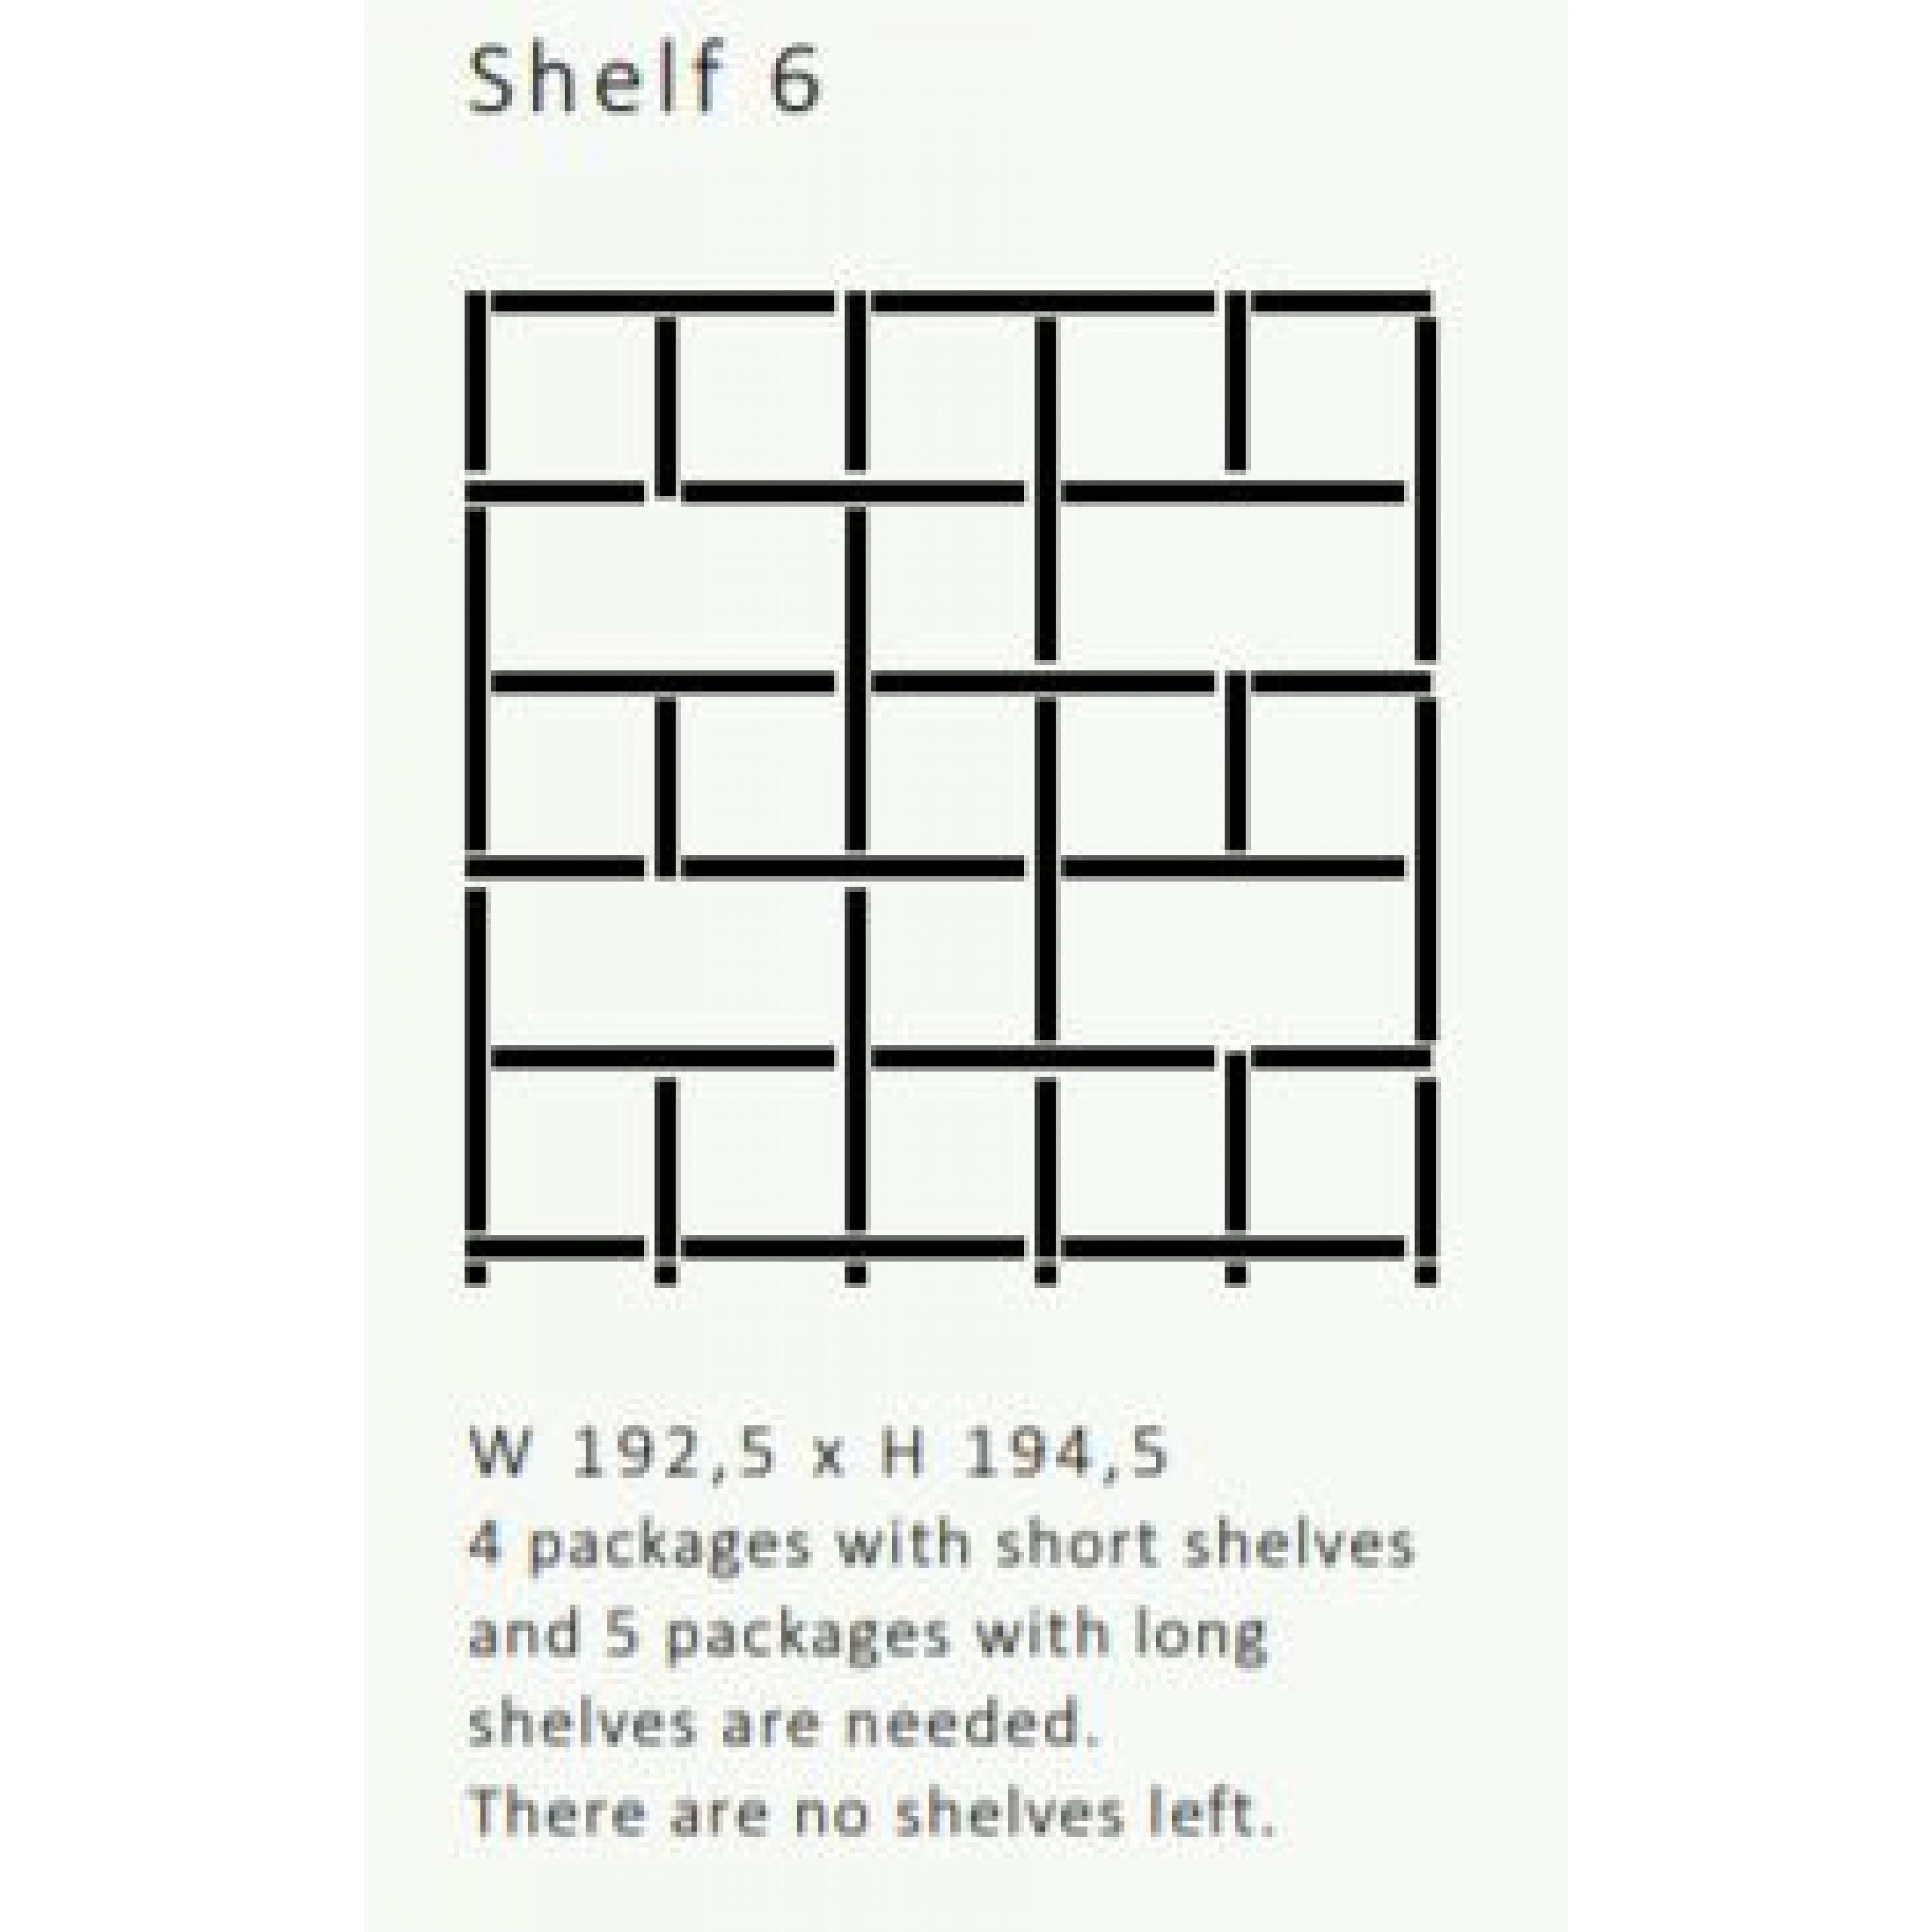 Shelving System 355 Version 6 | Beech Wood